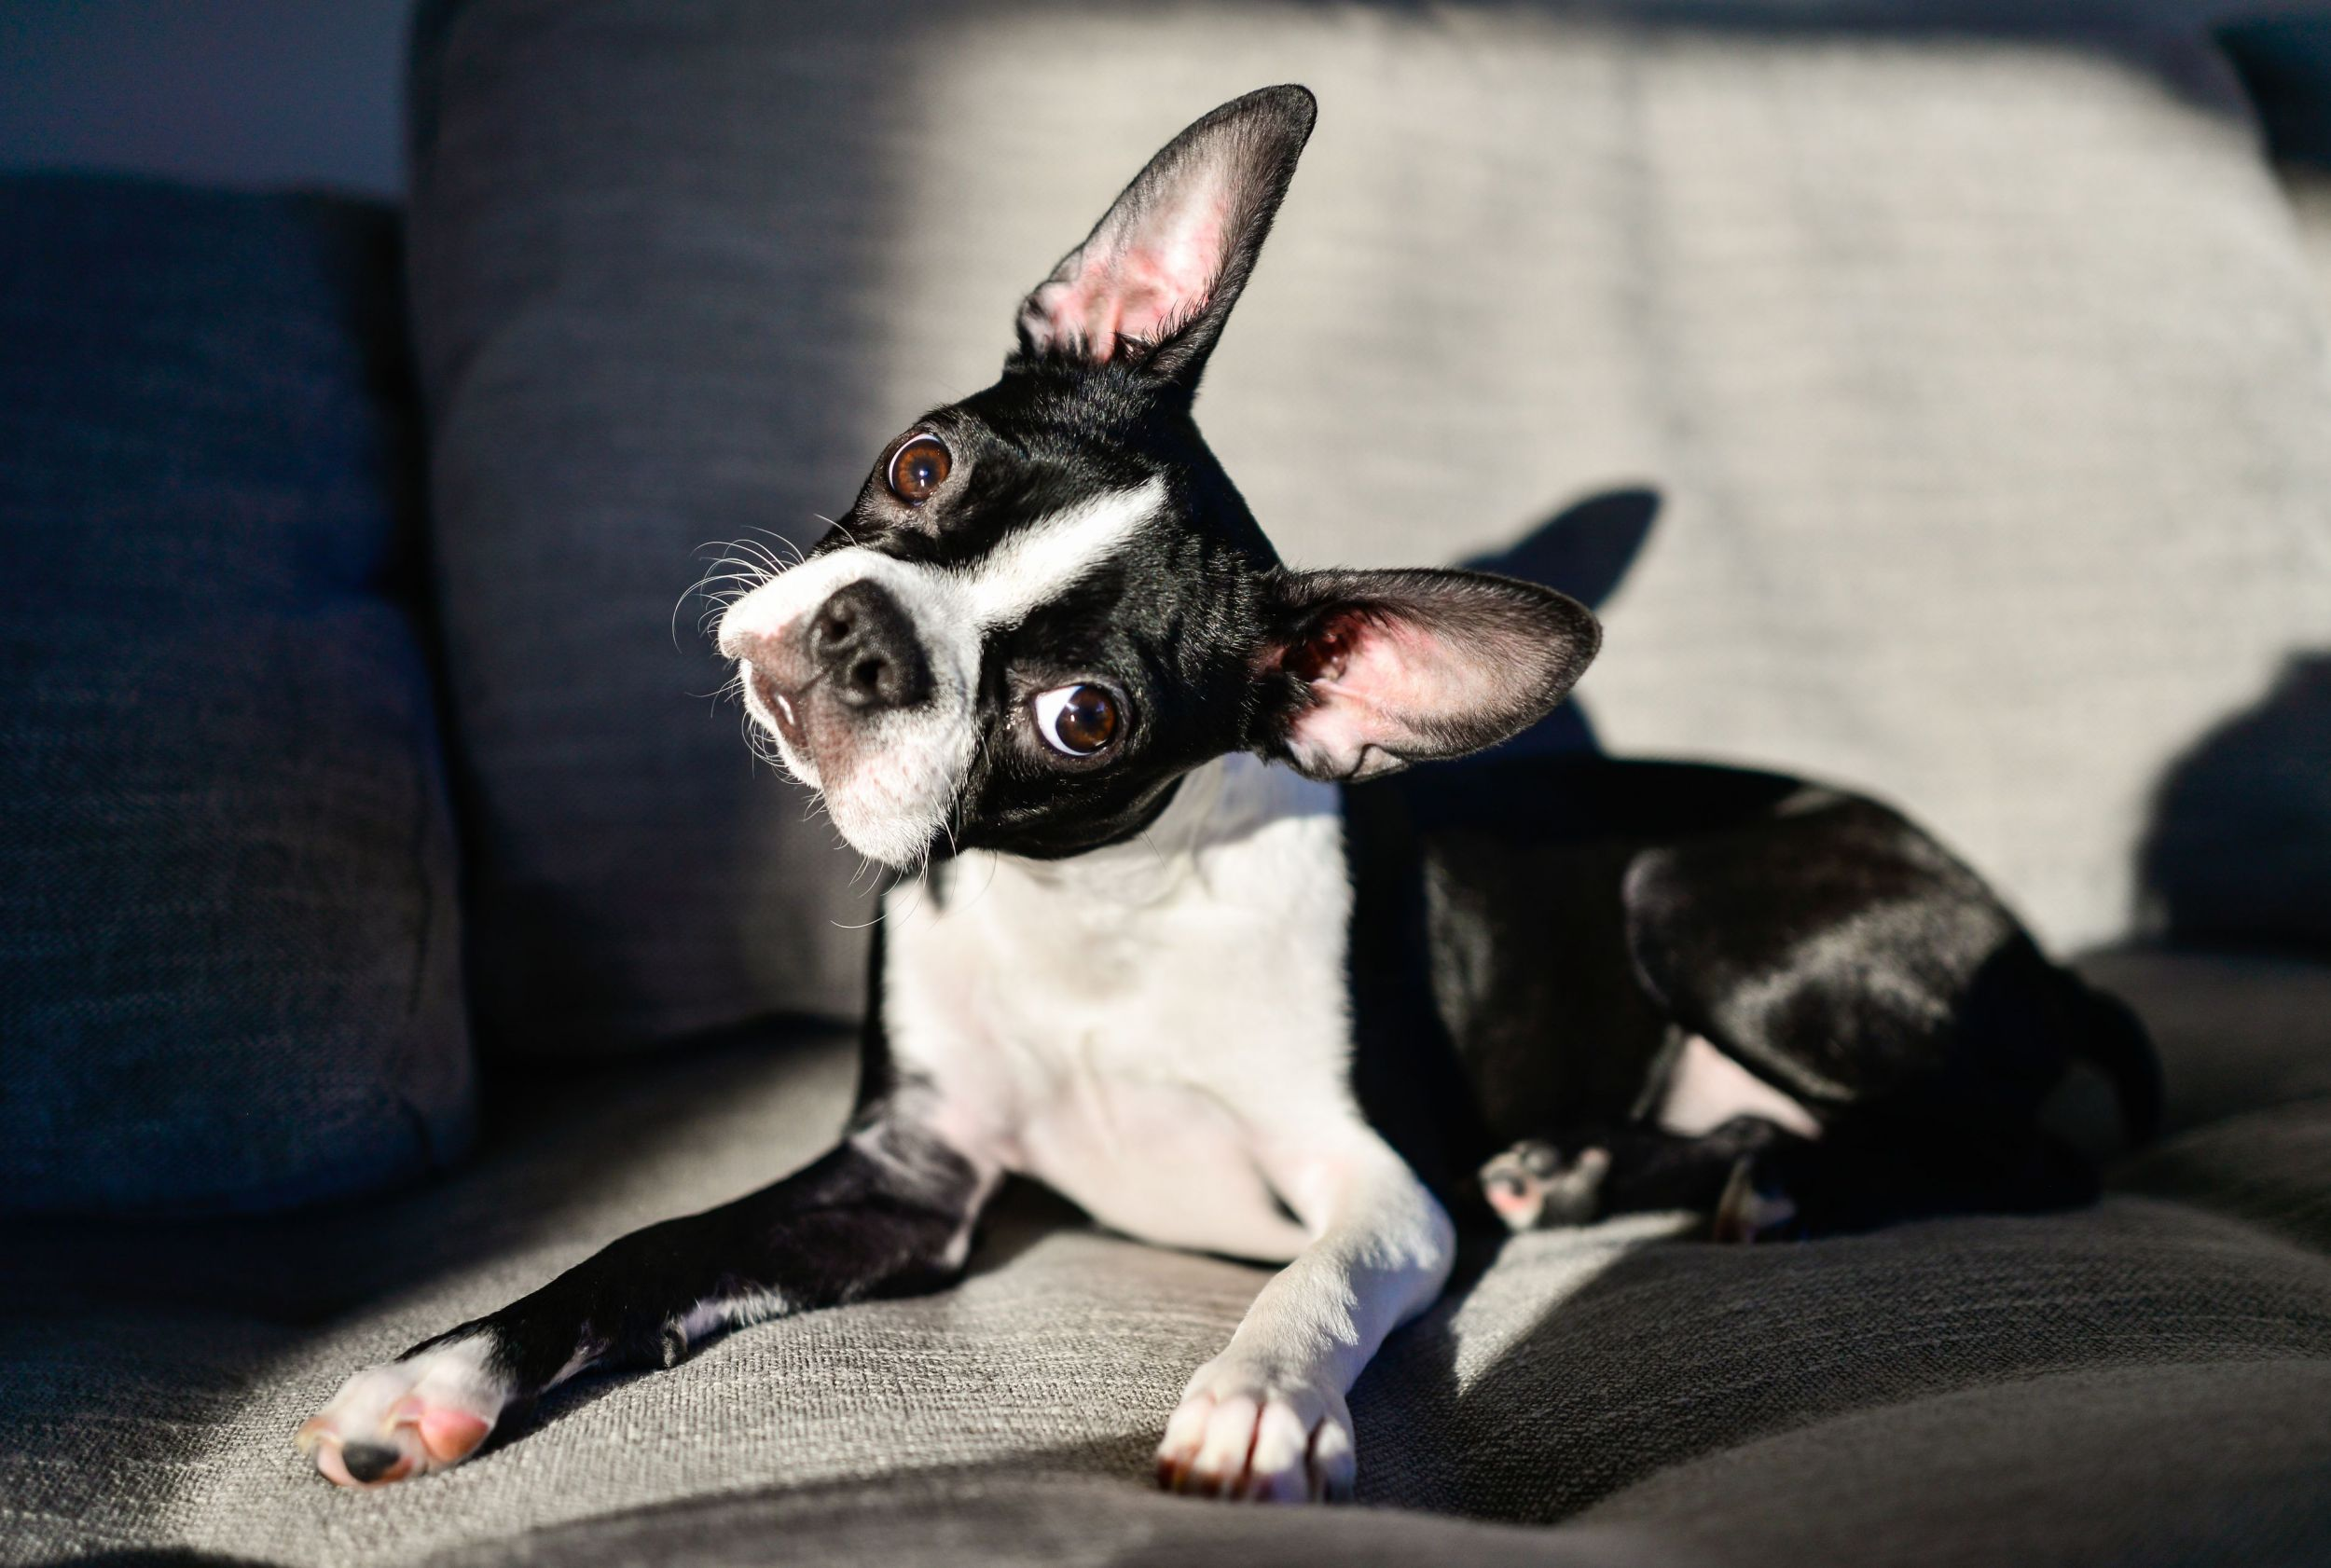 Dogilike.com :: สงสัยป่ะ ... น้องหมาเอียงหัวฟังเราพูด แปลว่าเขาฟังรู้เรื่องใช่รึเปล่านะ